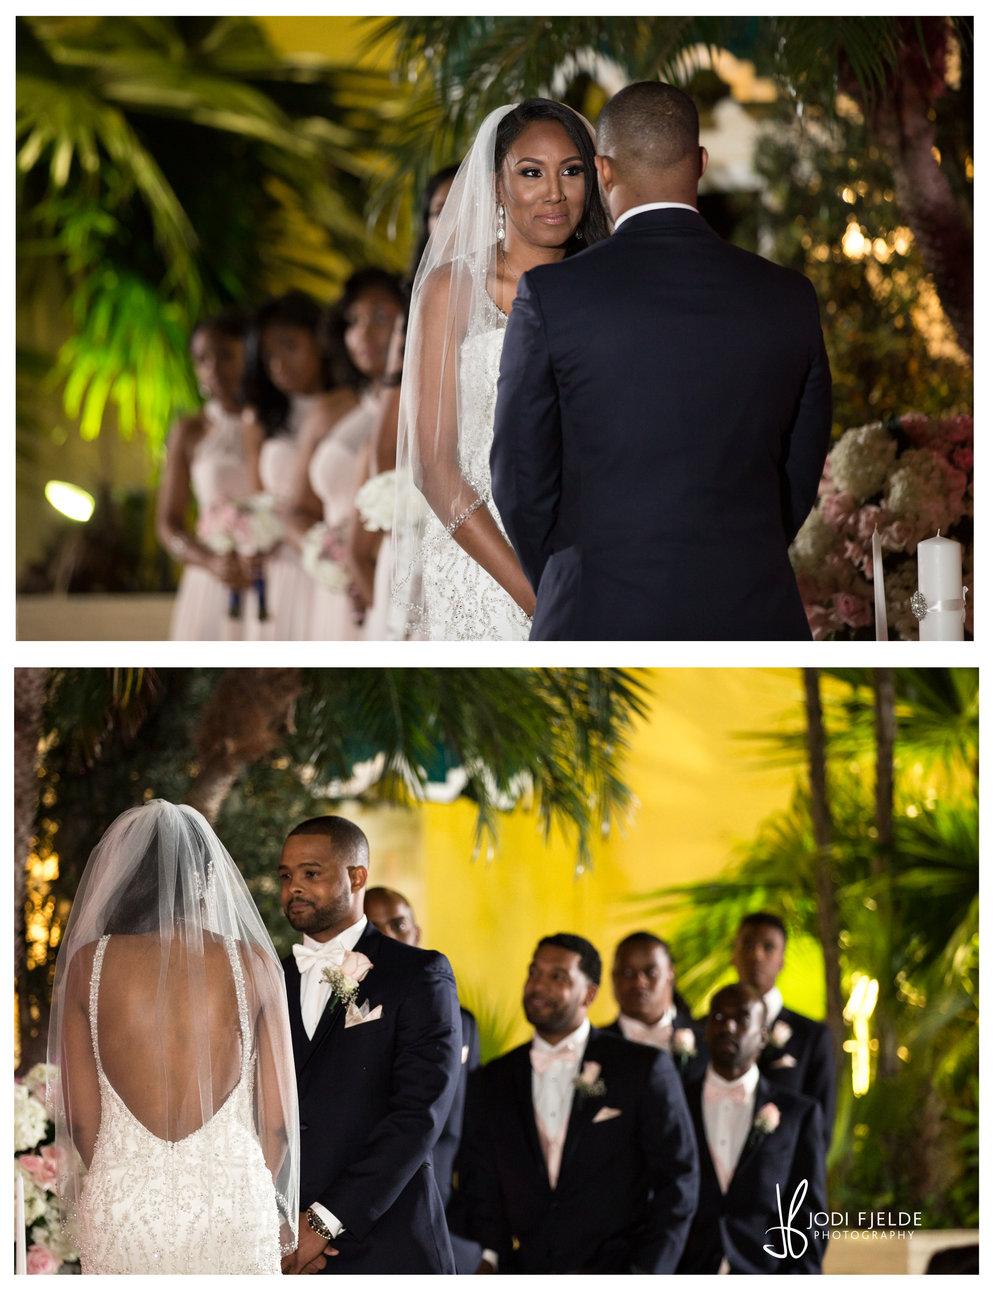 Benvenuto_wedding_Boynton_Beach_Jodi_Fjelde_Photography_Nikki_Otis_married_15.jpg